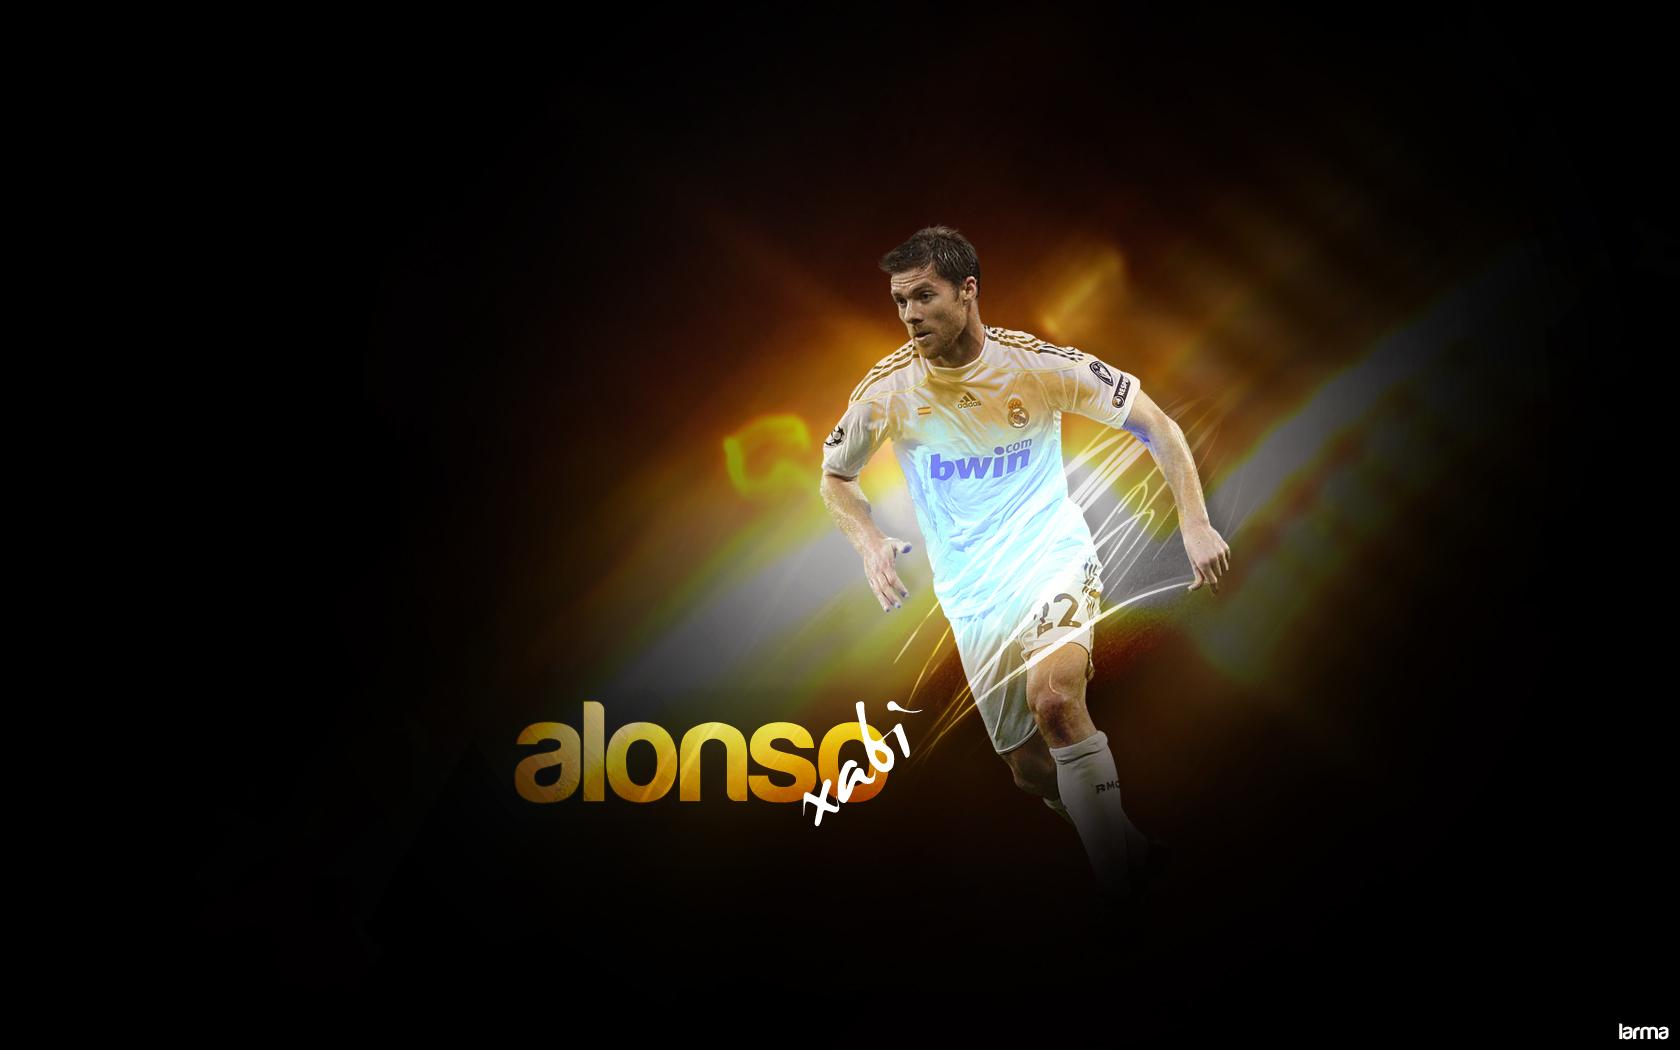 Xabi Alonso Best Wallpaper   Football HD Wallpapers 1680x1050